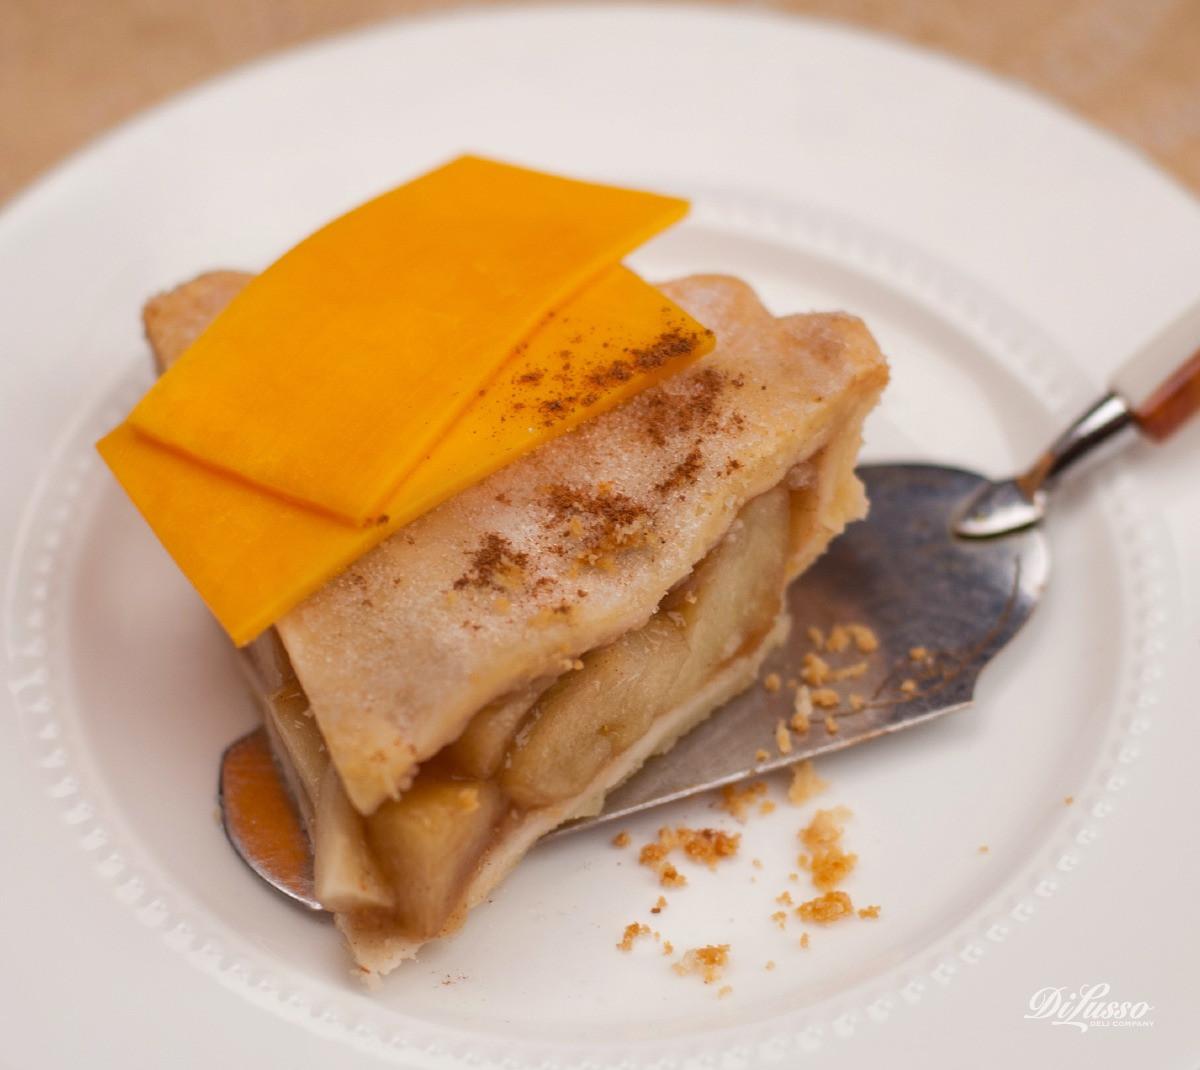 Apple Pie With Cheese  Cheddar Apple Pie Di Lusso Deli